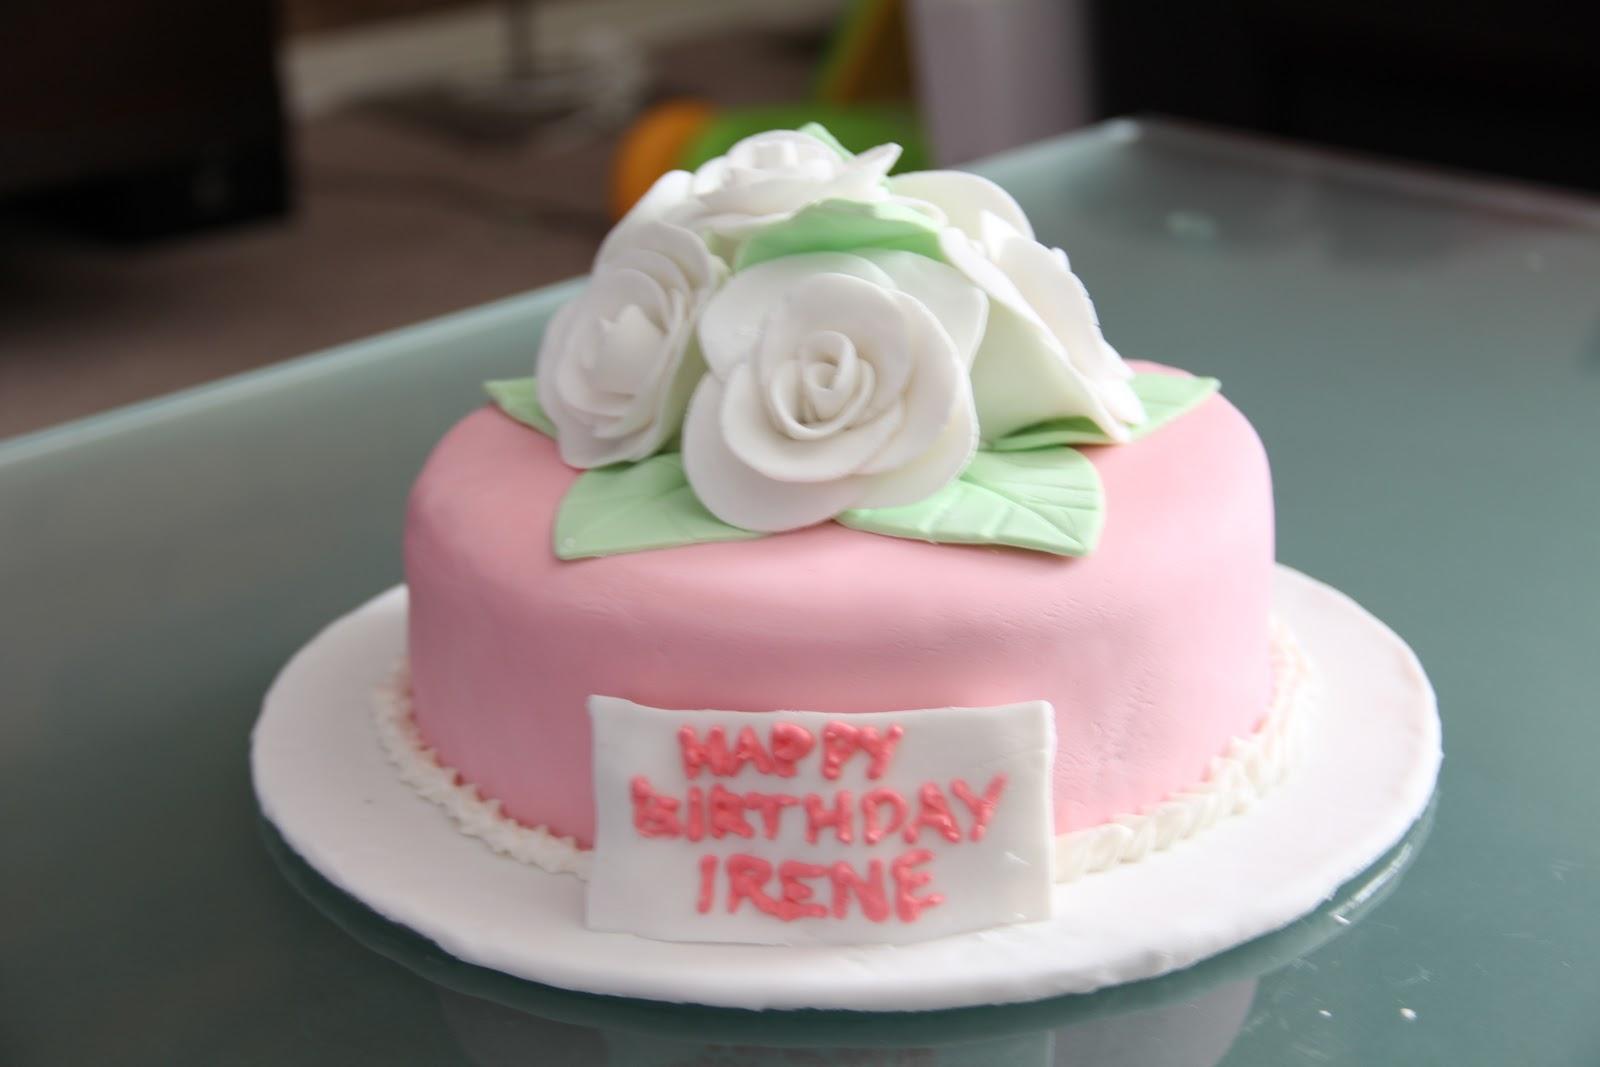 Bakerz Dad Bakerz Mum Birthday Cake